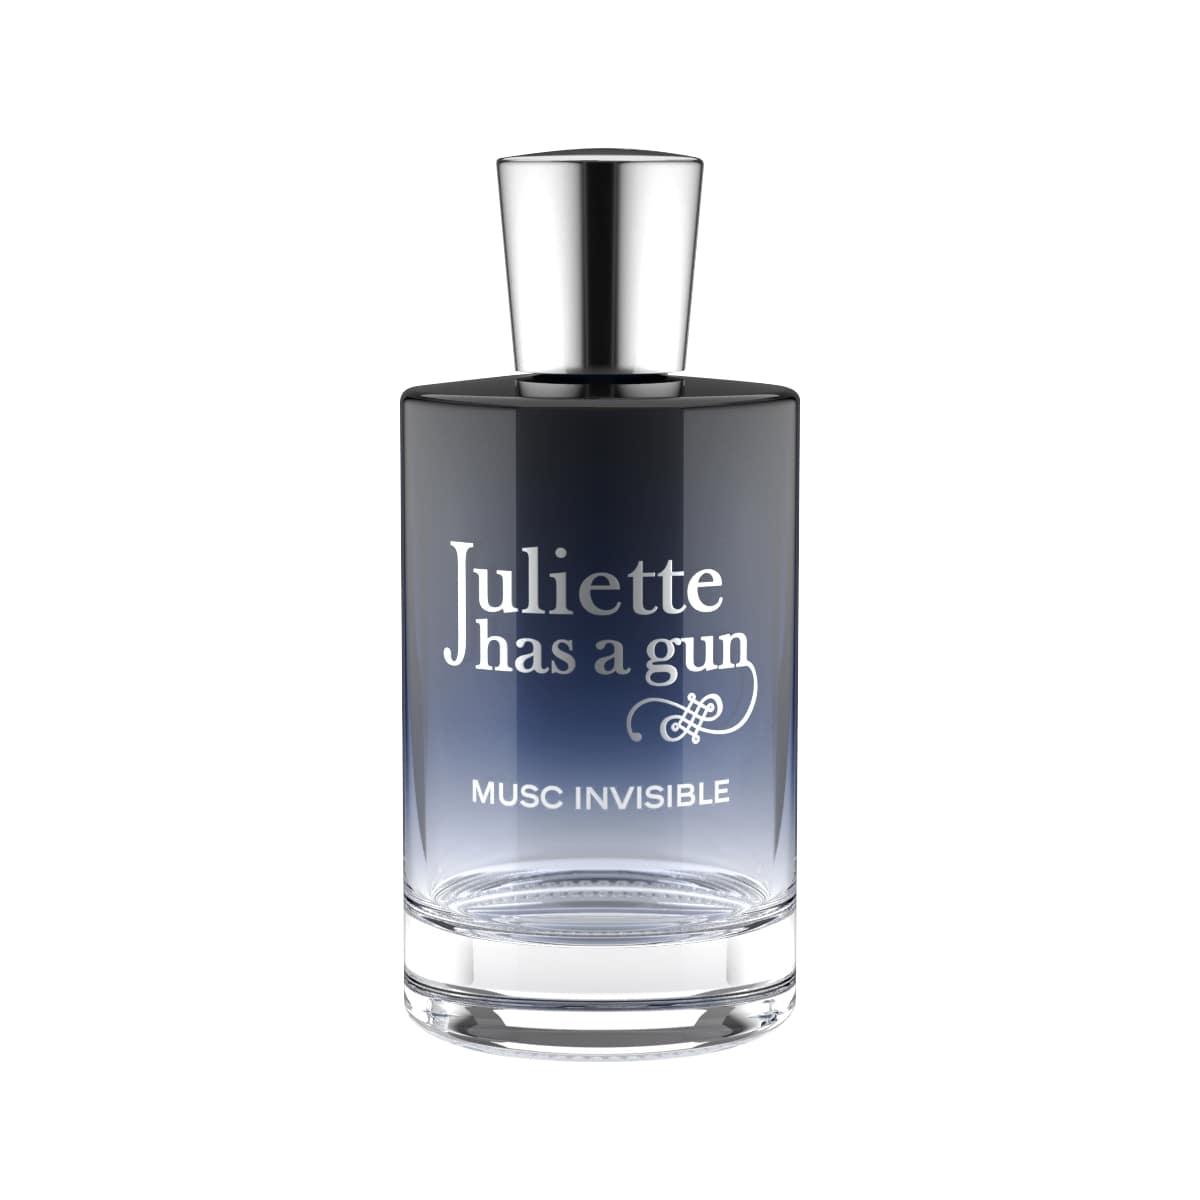 Juliette has a gun Musc Invisible EDP, 100 ml